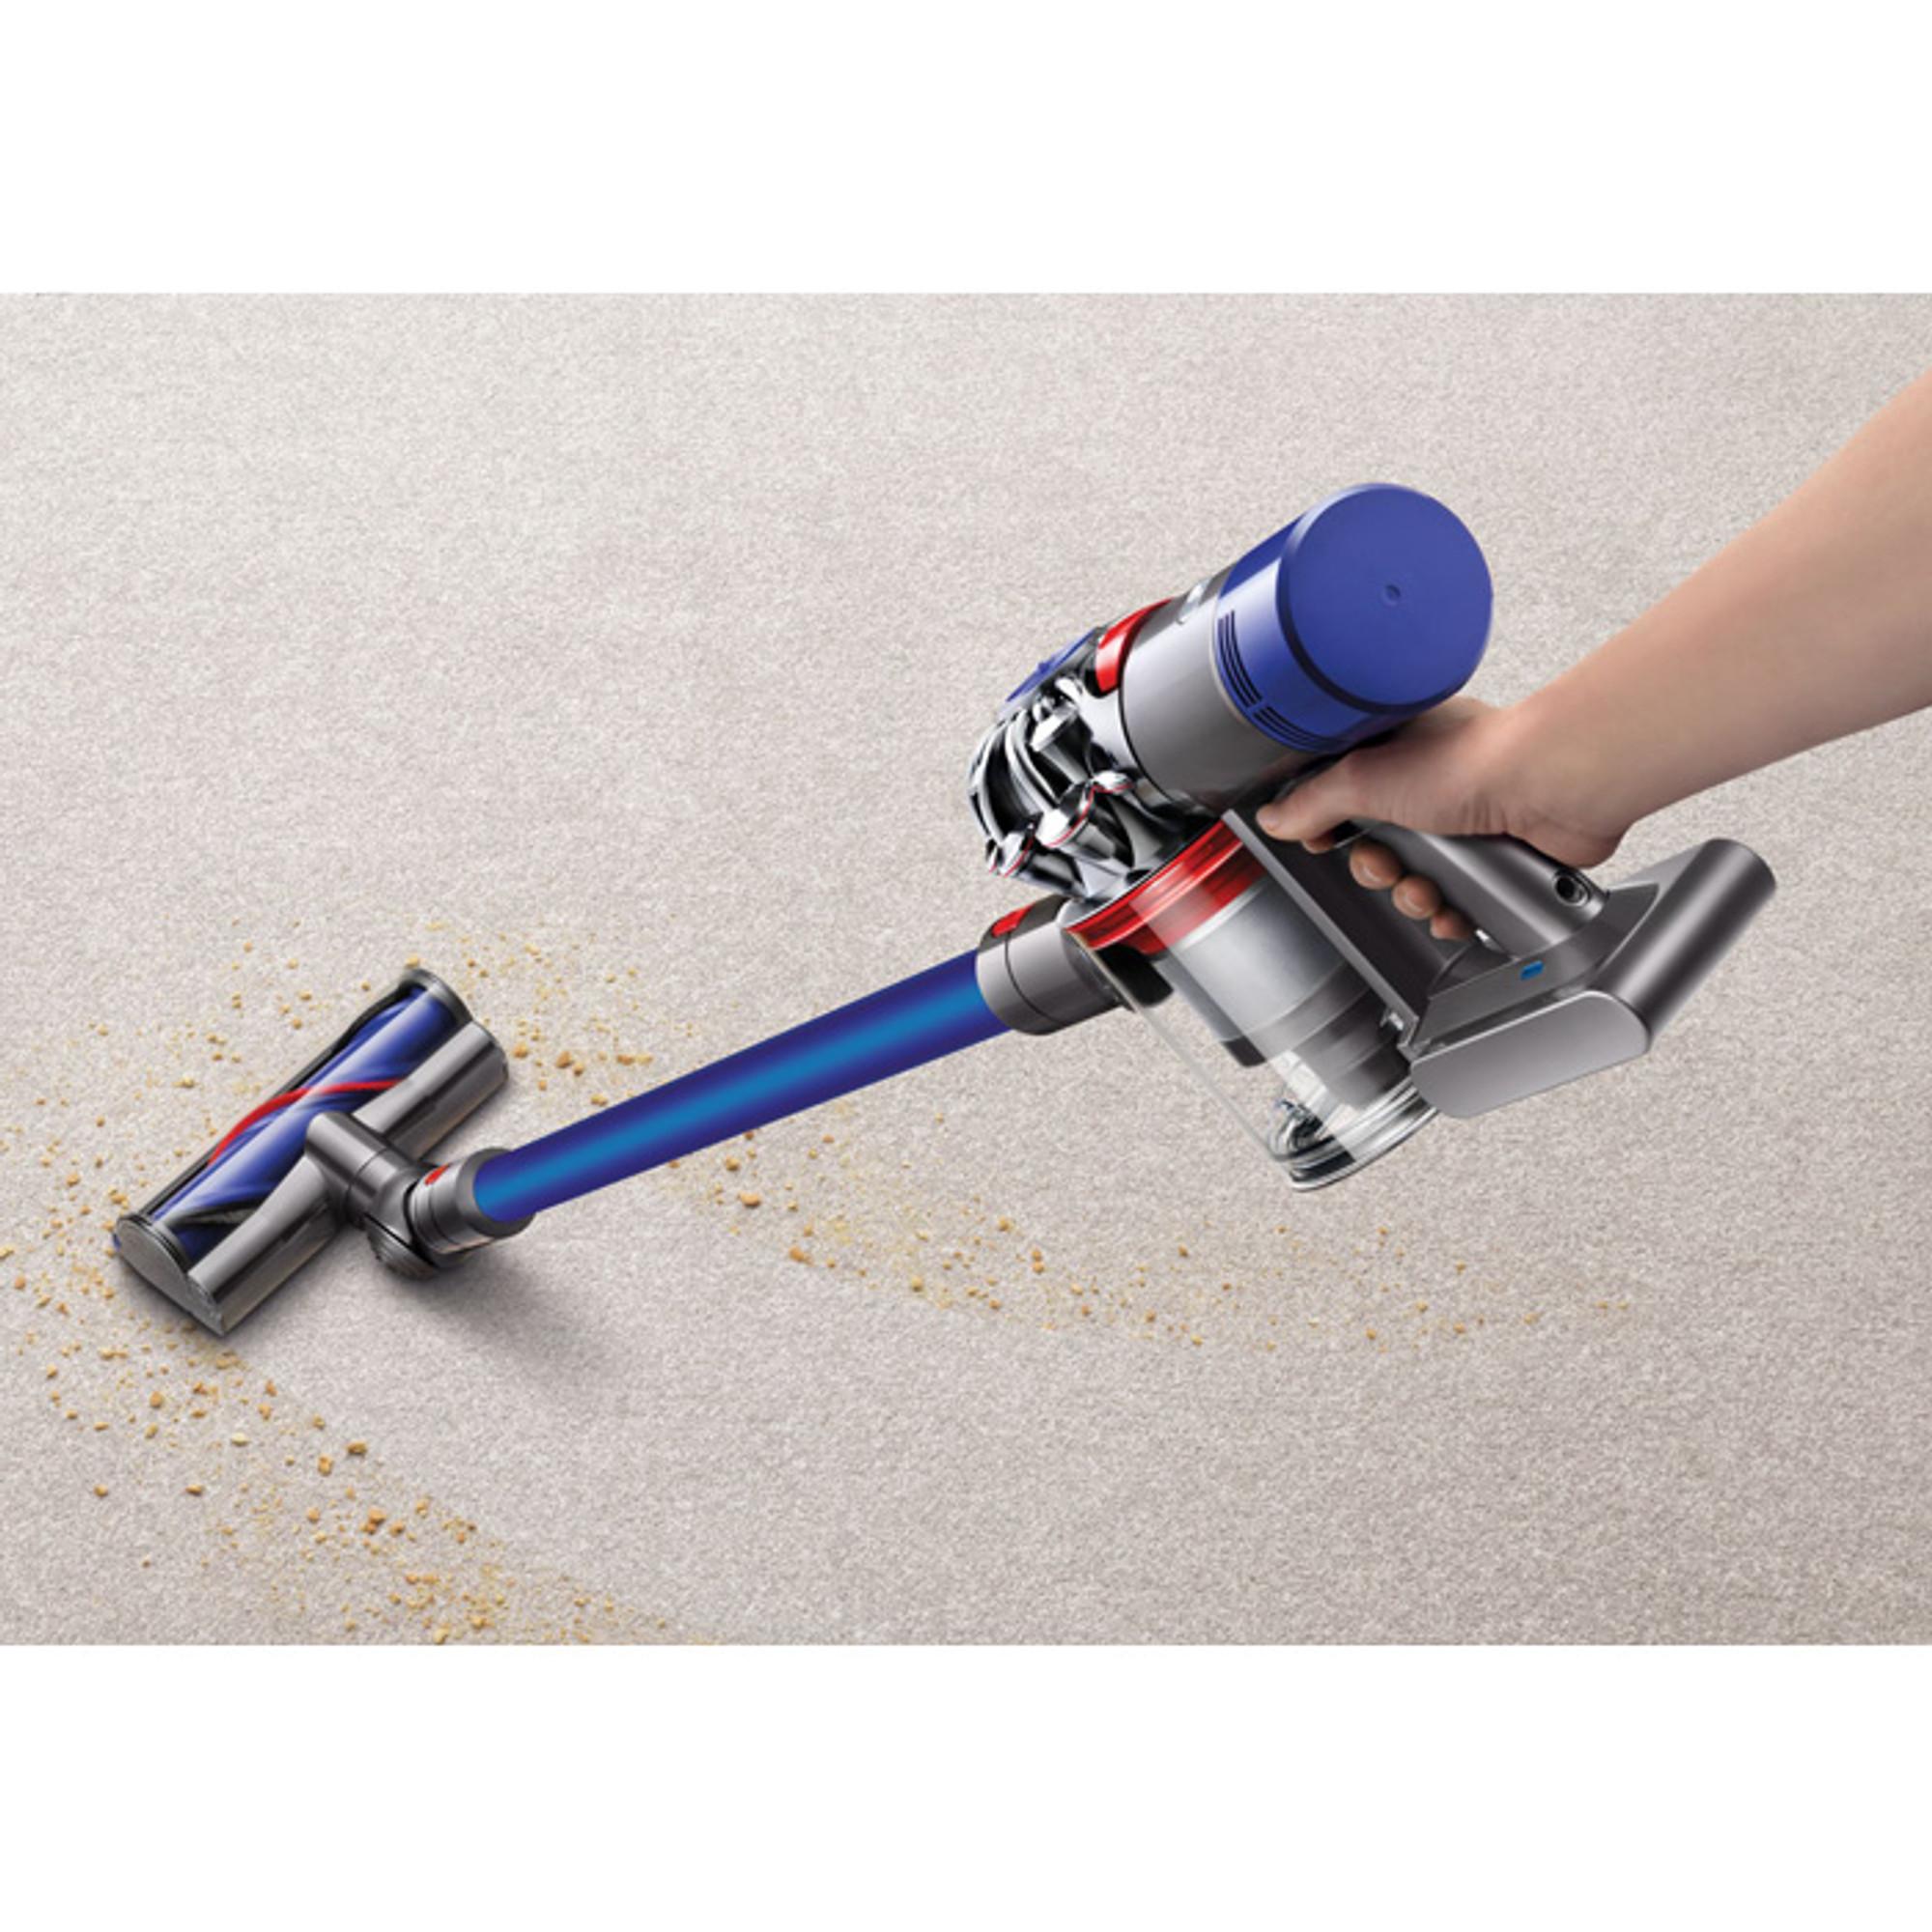 Handheld Carpet Cleaner Rental